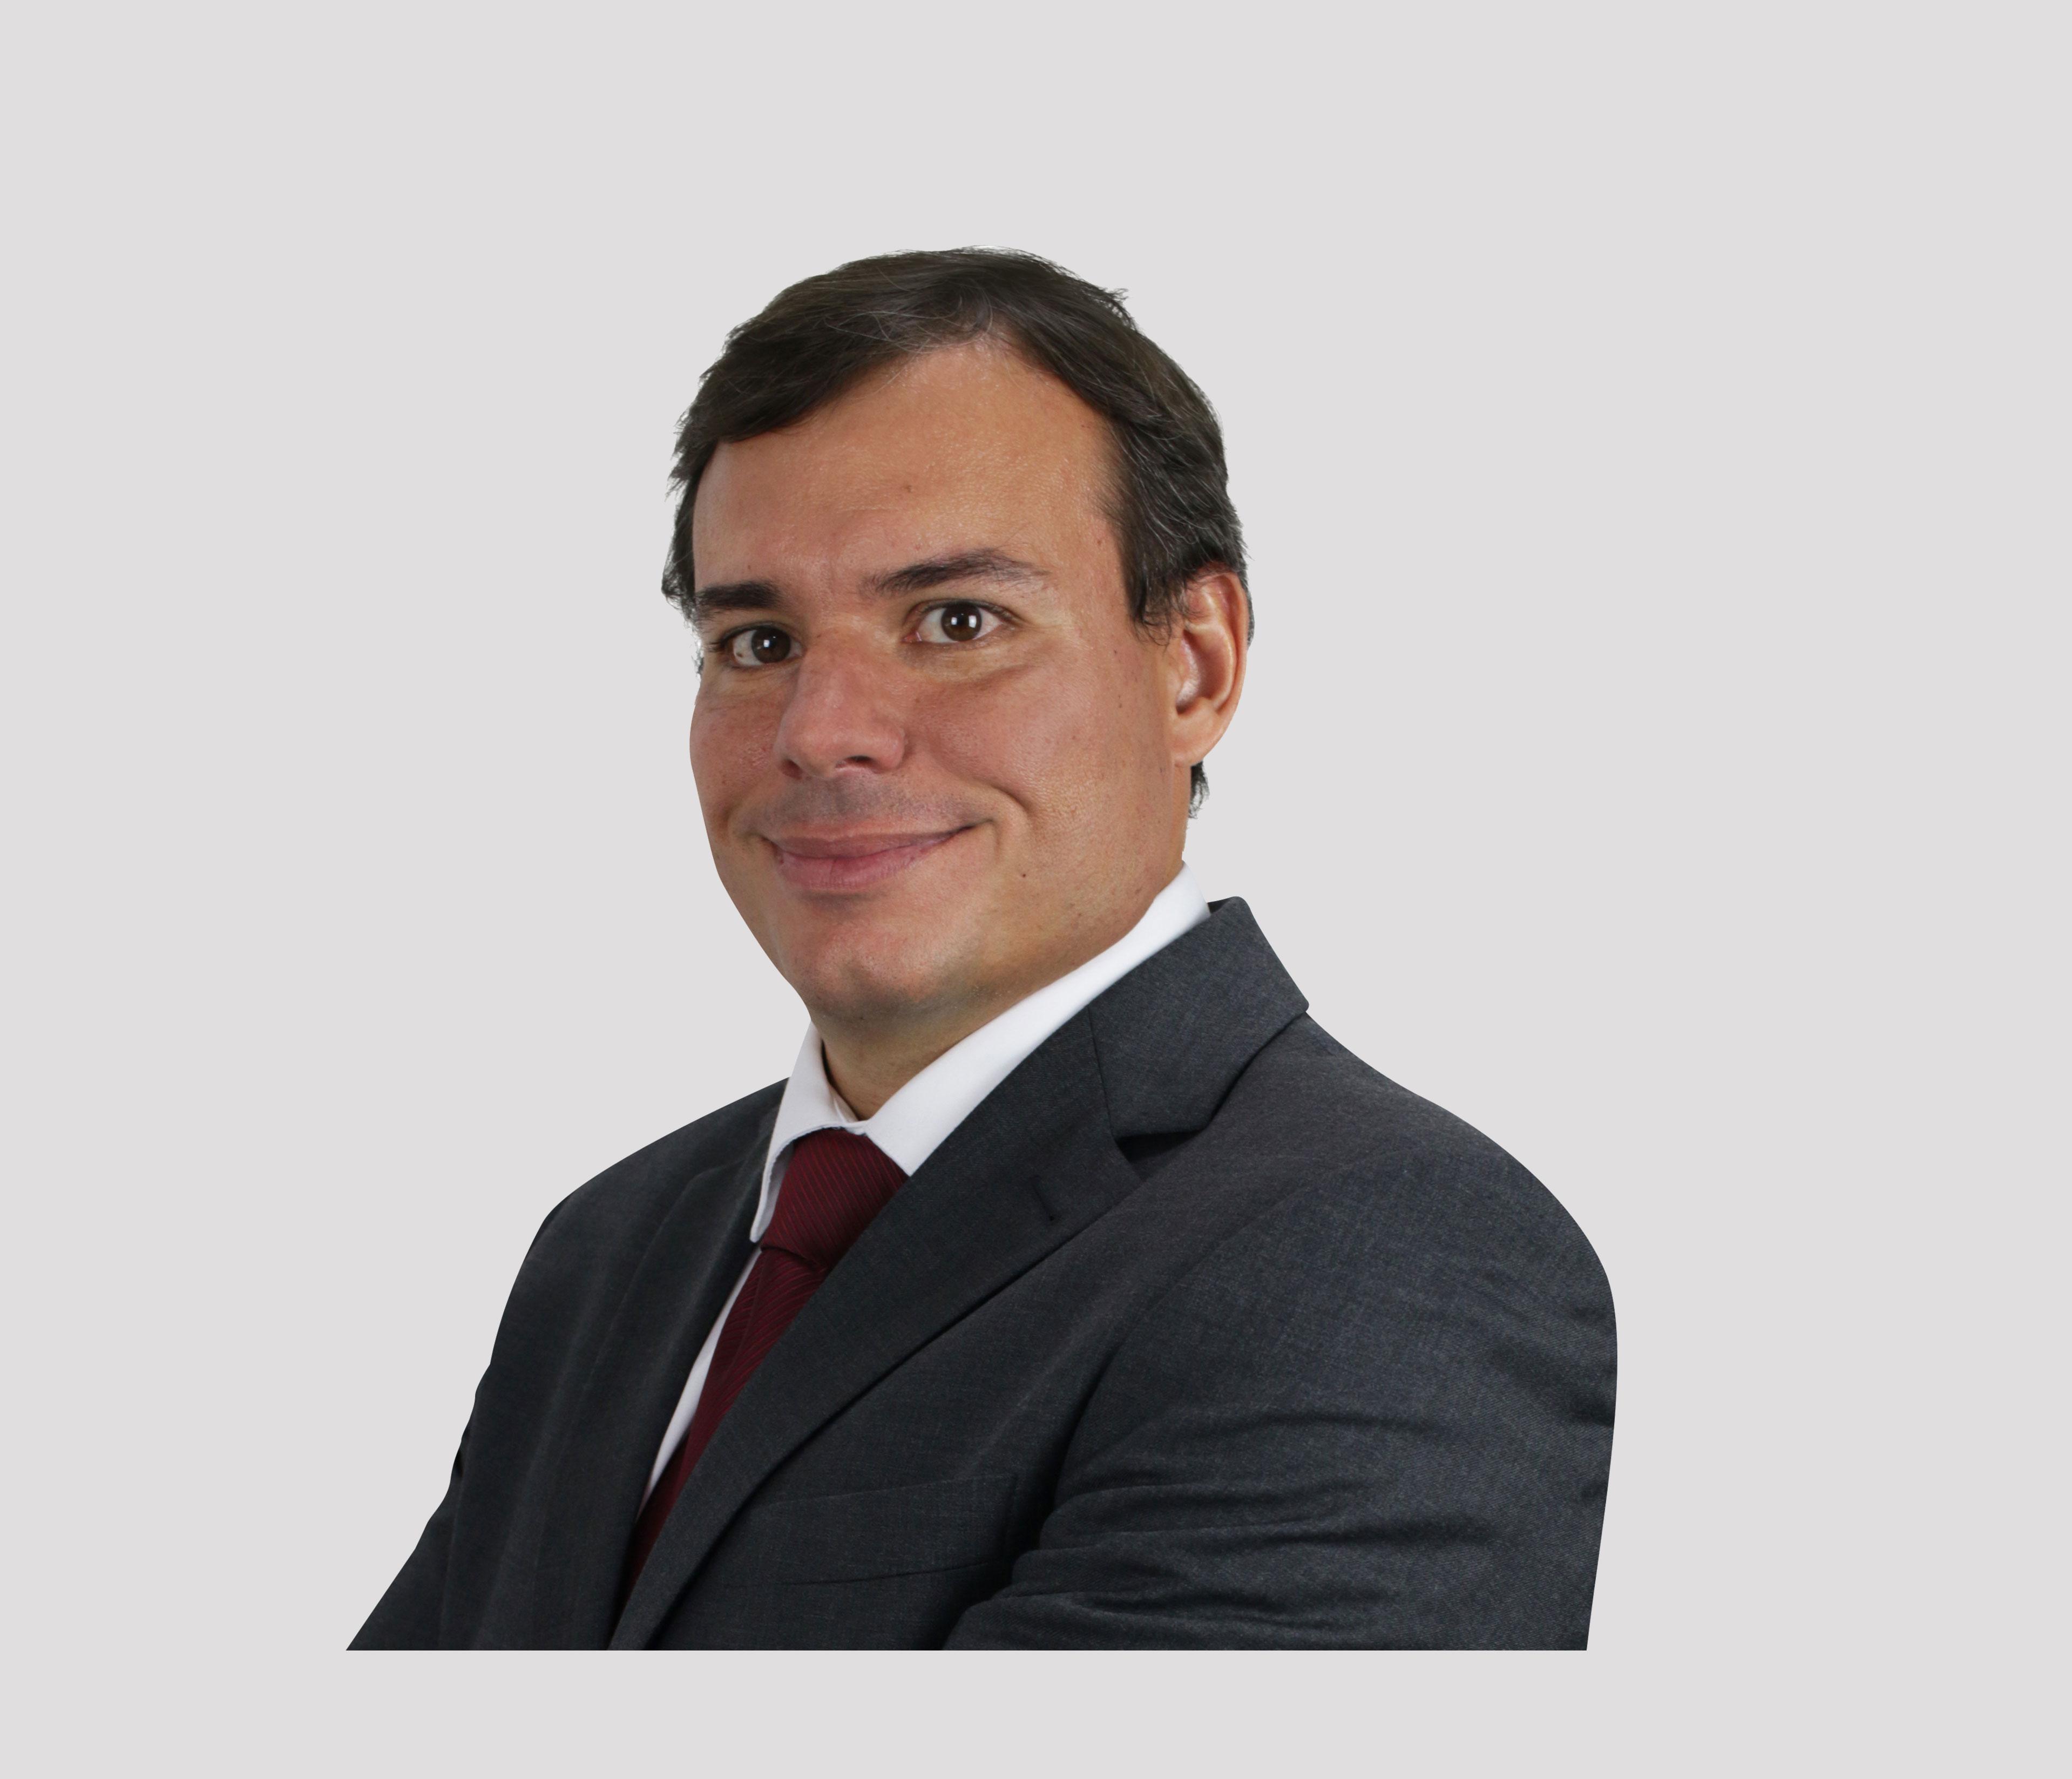 Ivan Kertziman